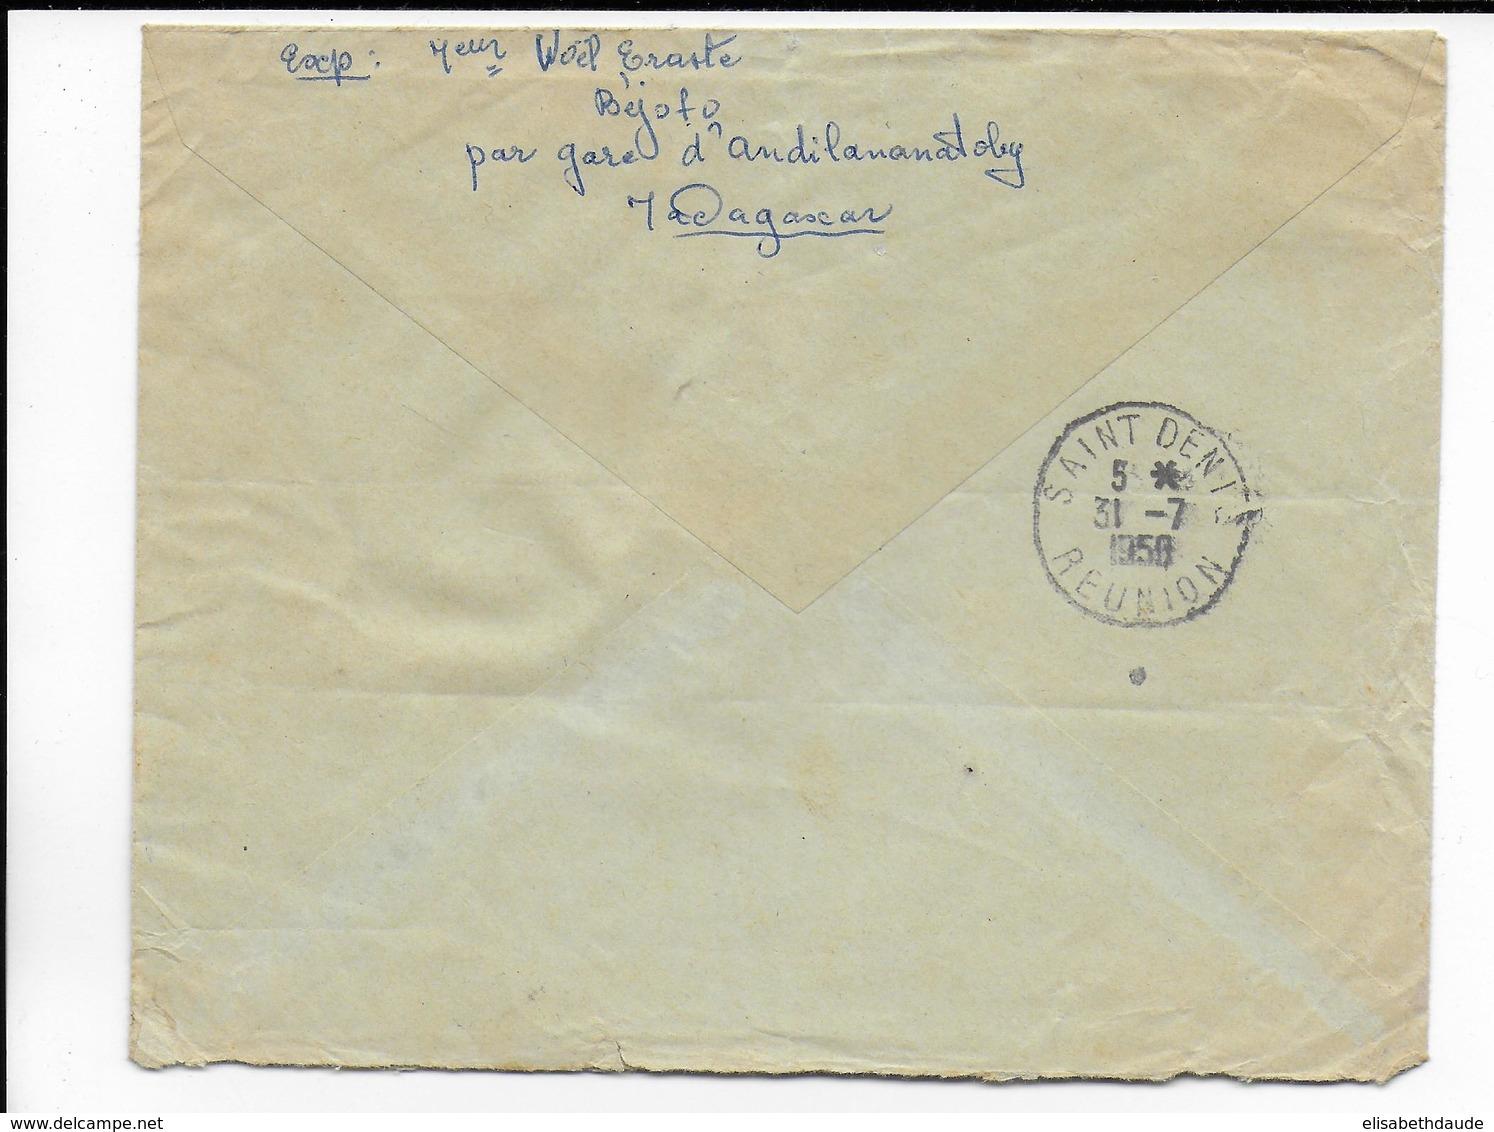 1958 - MADAGASCAR - ENVELOPPE Par AVION RECOMMANDEE De MANAKAMBAHINY ! => ST DENIS REUNION - Madagascar (1889-1960)